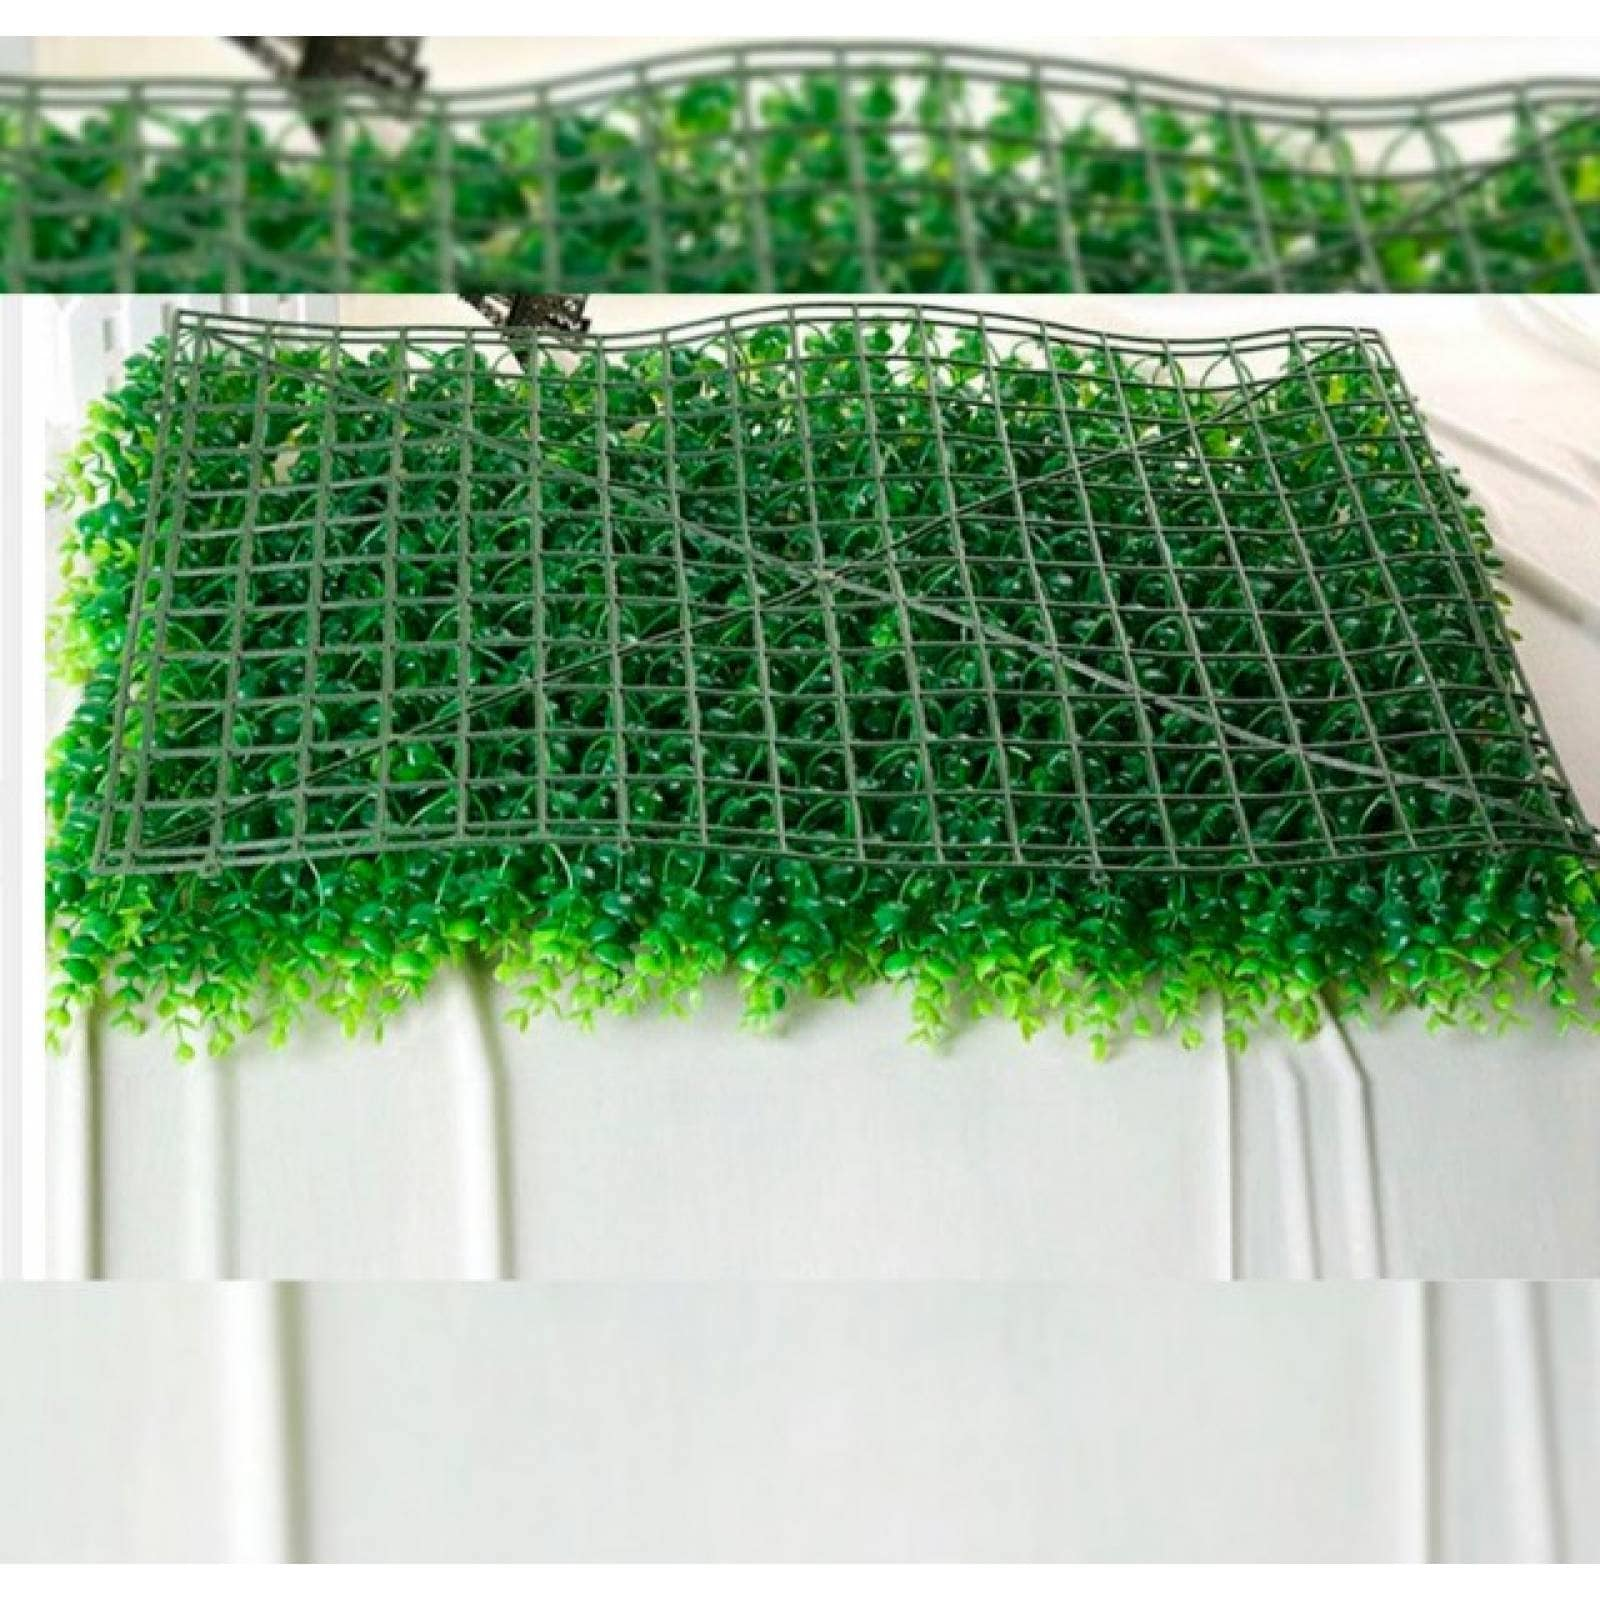 Follaje artificial 40x60 cm muro verde 4 piezas= 1m2 modelo tropical